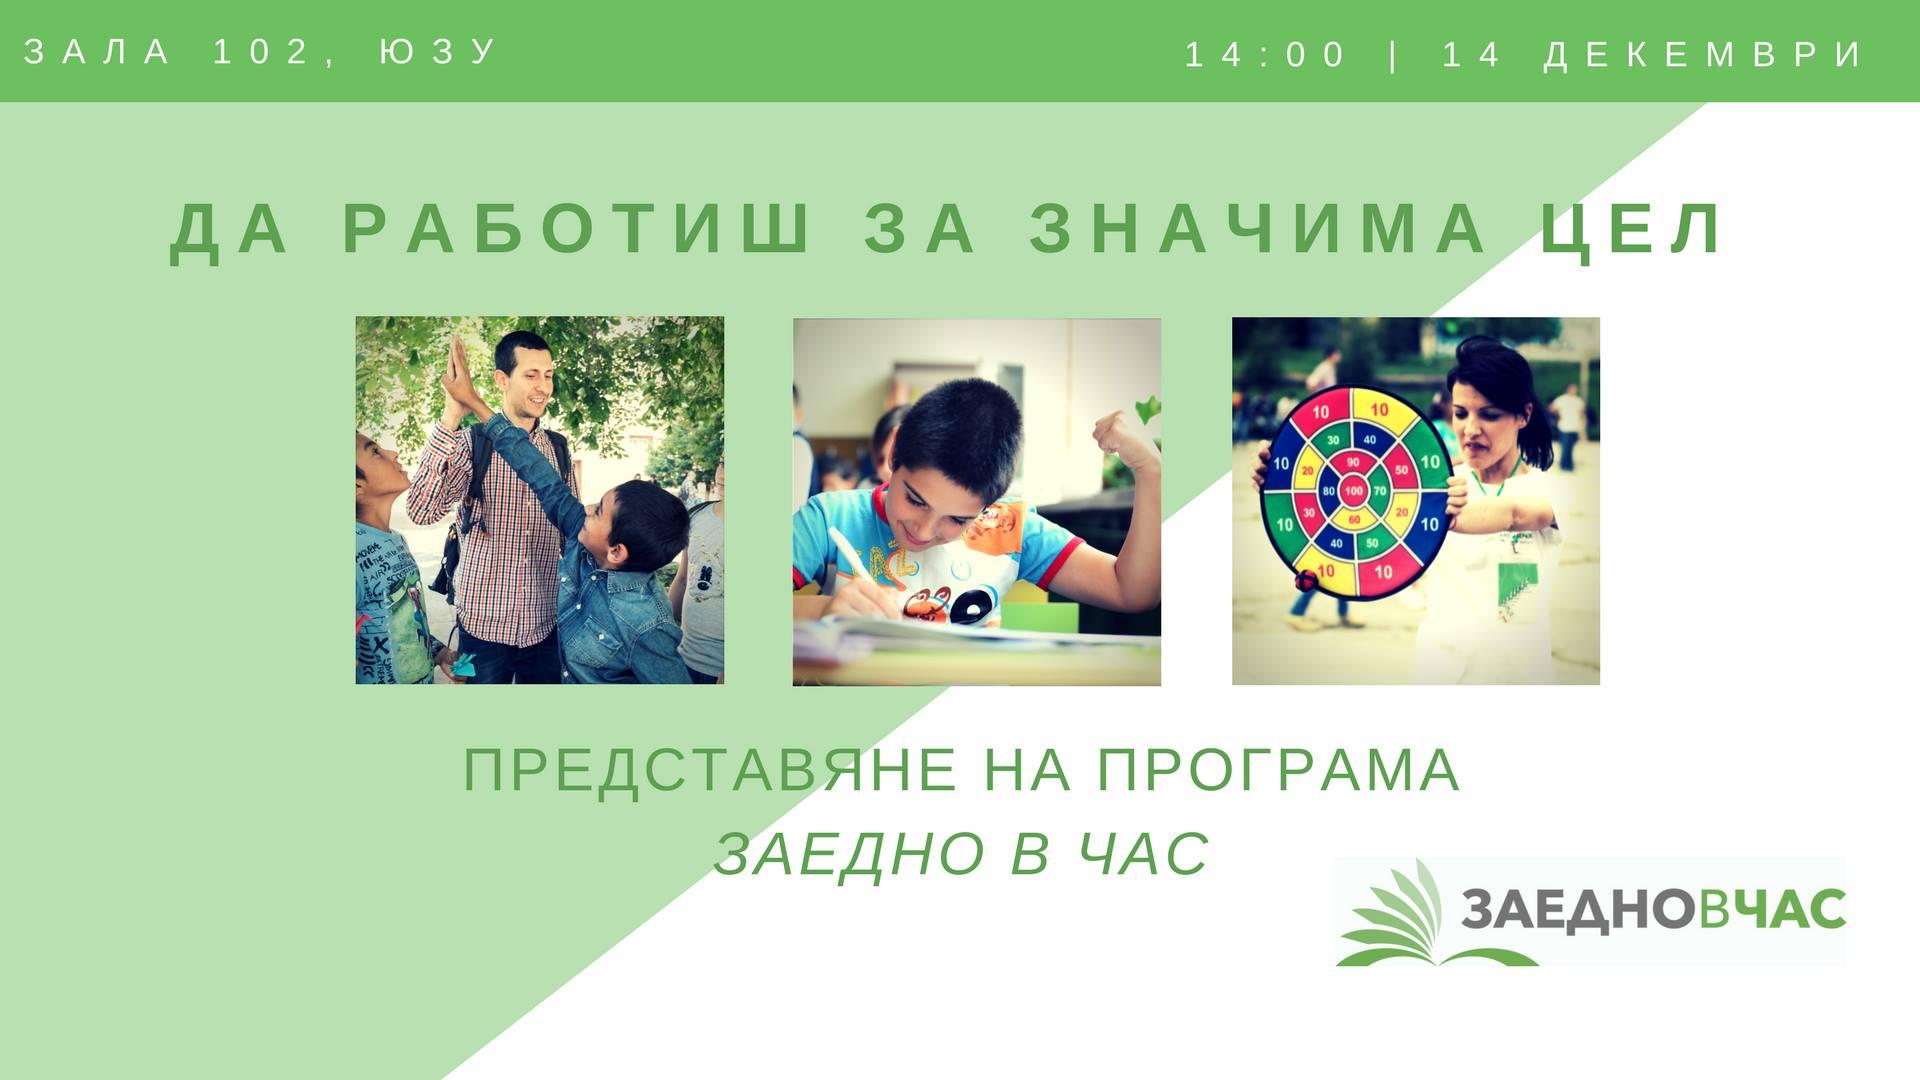 Представяне на програма